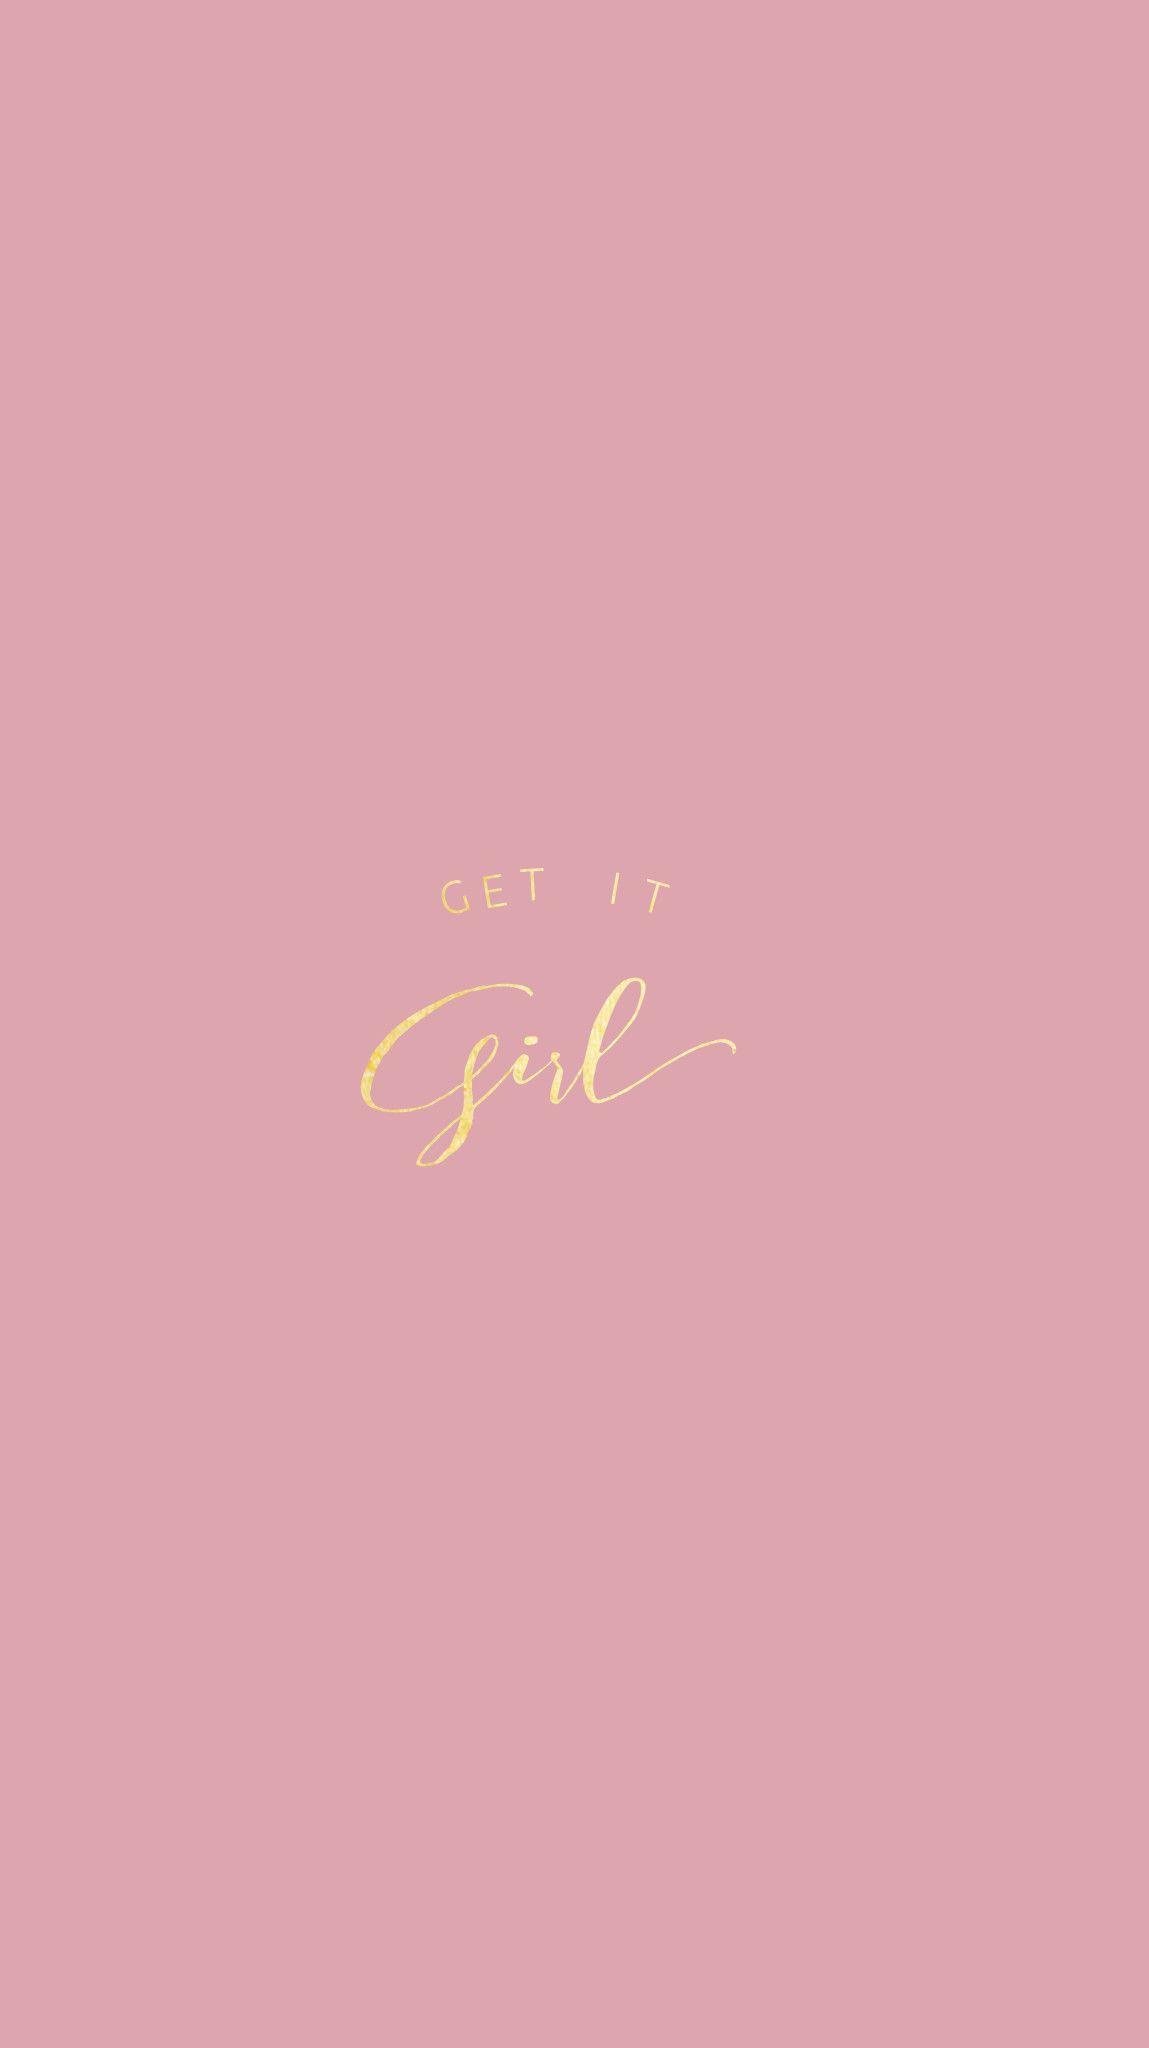 Res 1149x2048 Rose Gold Pretty Positivitya Iphone Wallpaper Evaland Rose Gold Wallpaper Iphone Gold Wallpaper Iphone Rose Gold Wallpaper